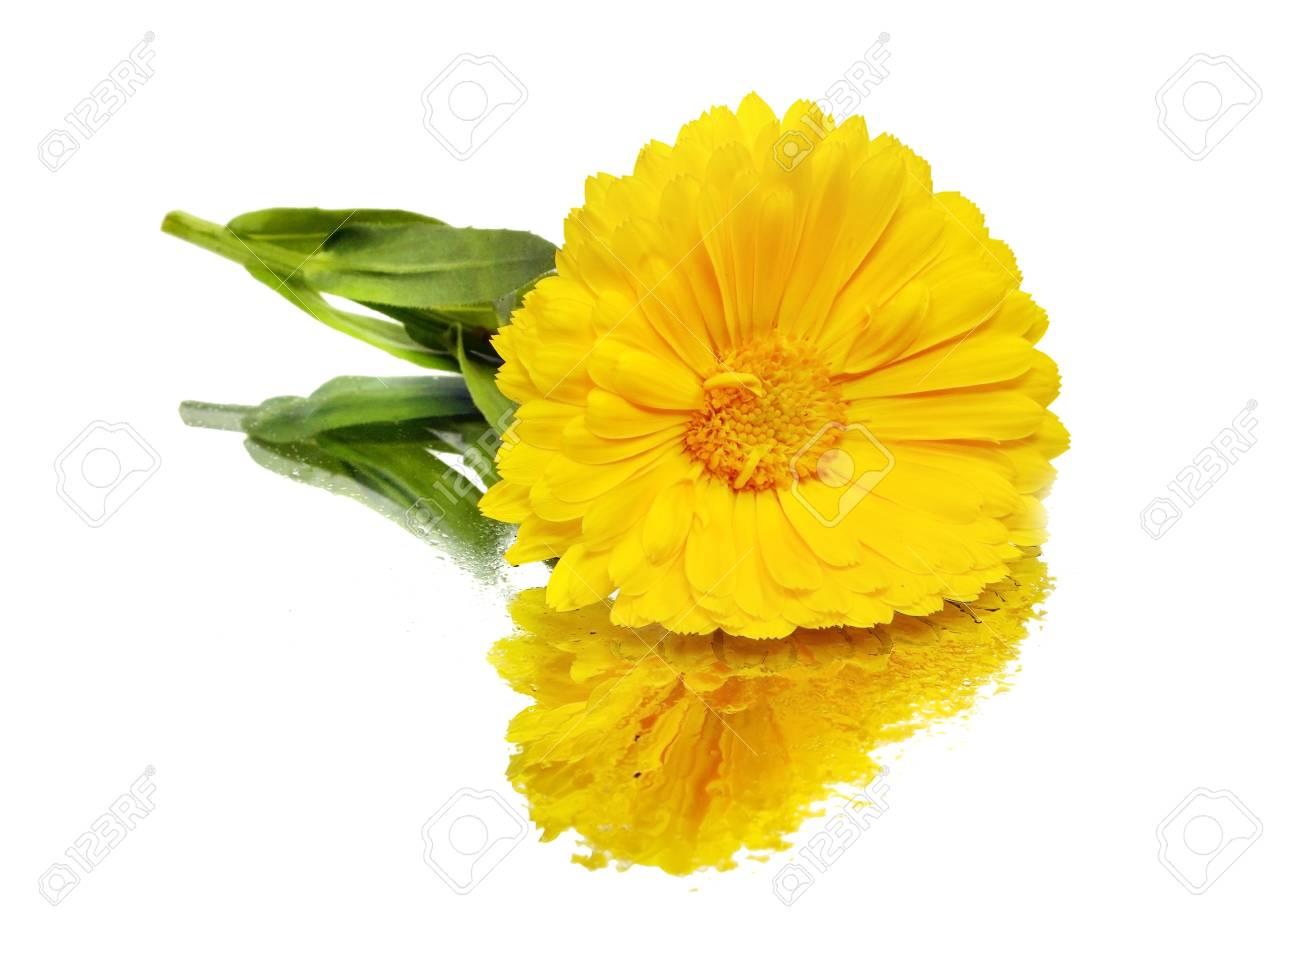 calendula flower on a